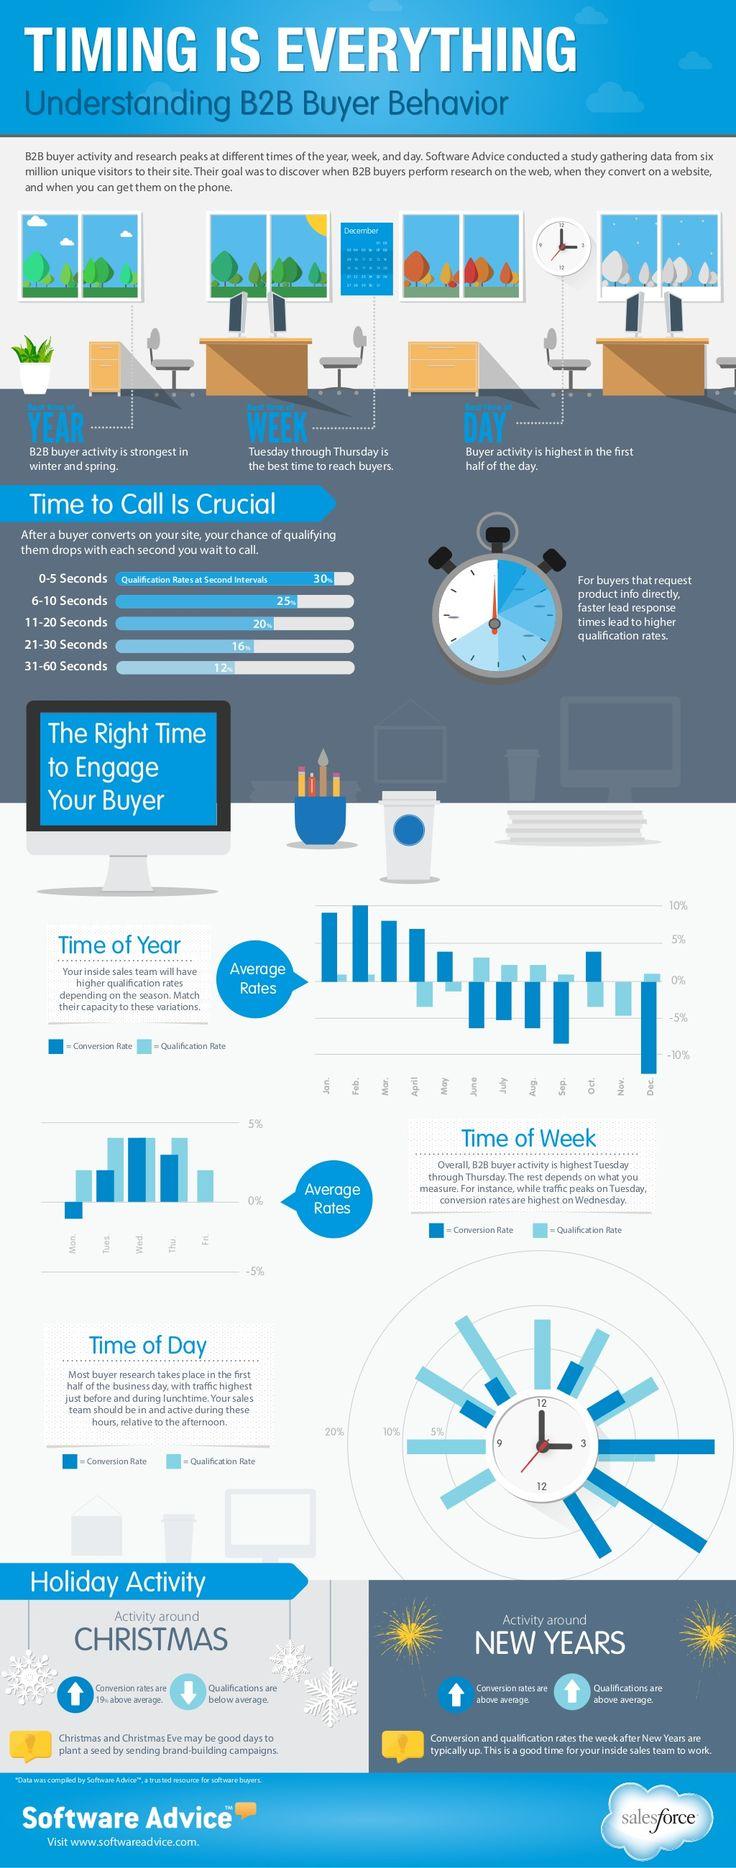 Timing is Everything: Understanding B2B Buyer Behavior